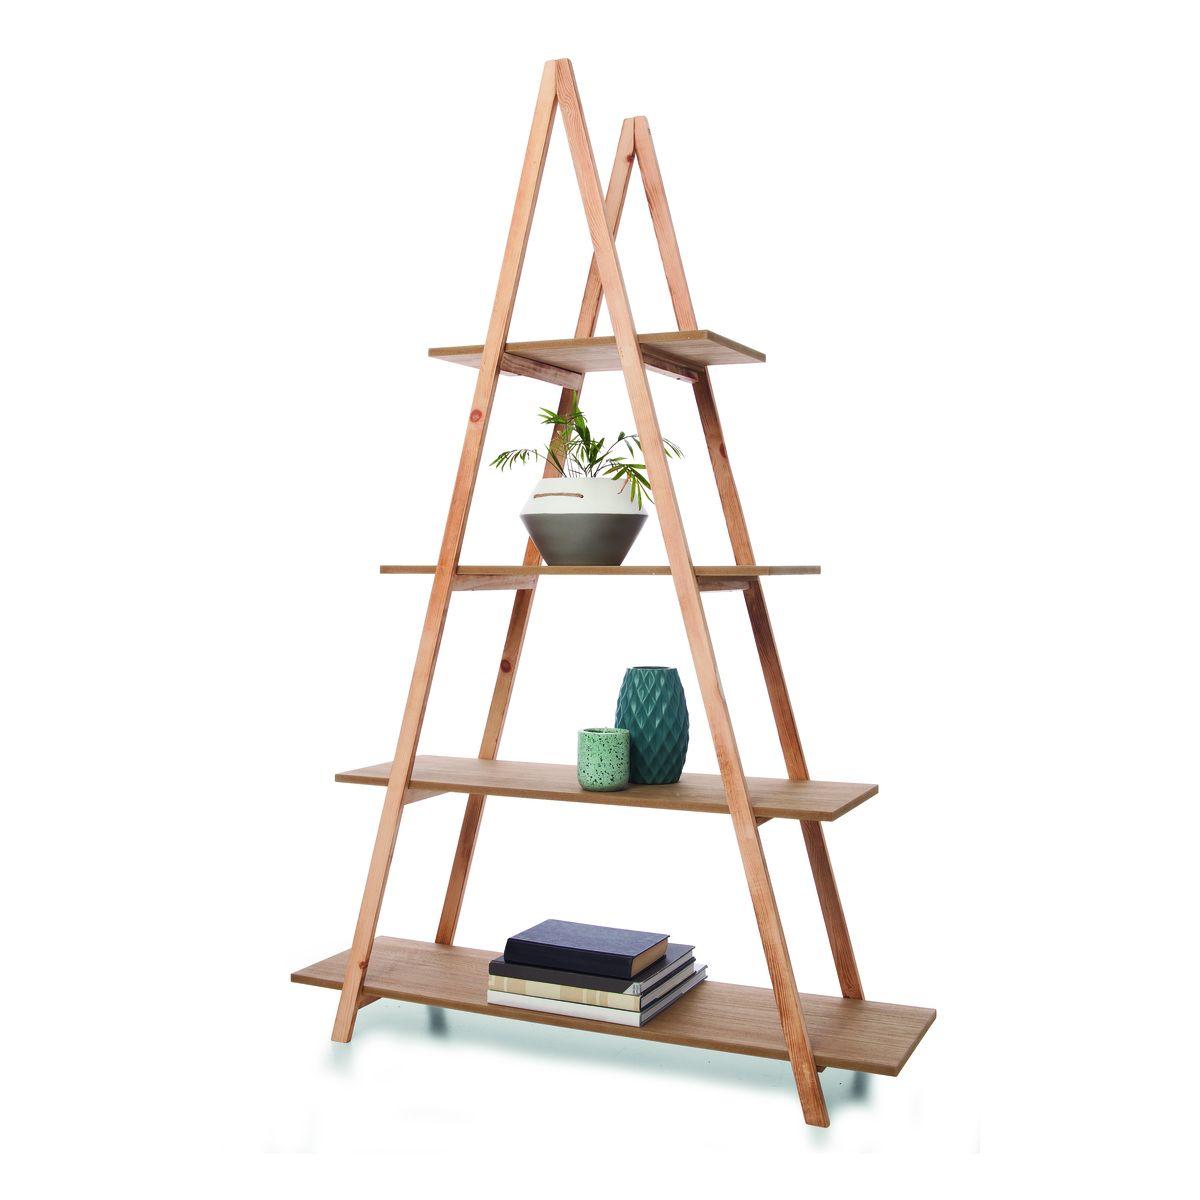 A Frame Bookshelf Natural Kmart A Frame Bookshelf Mini Bookshelf Bookshelf Decor